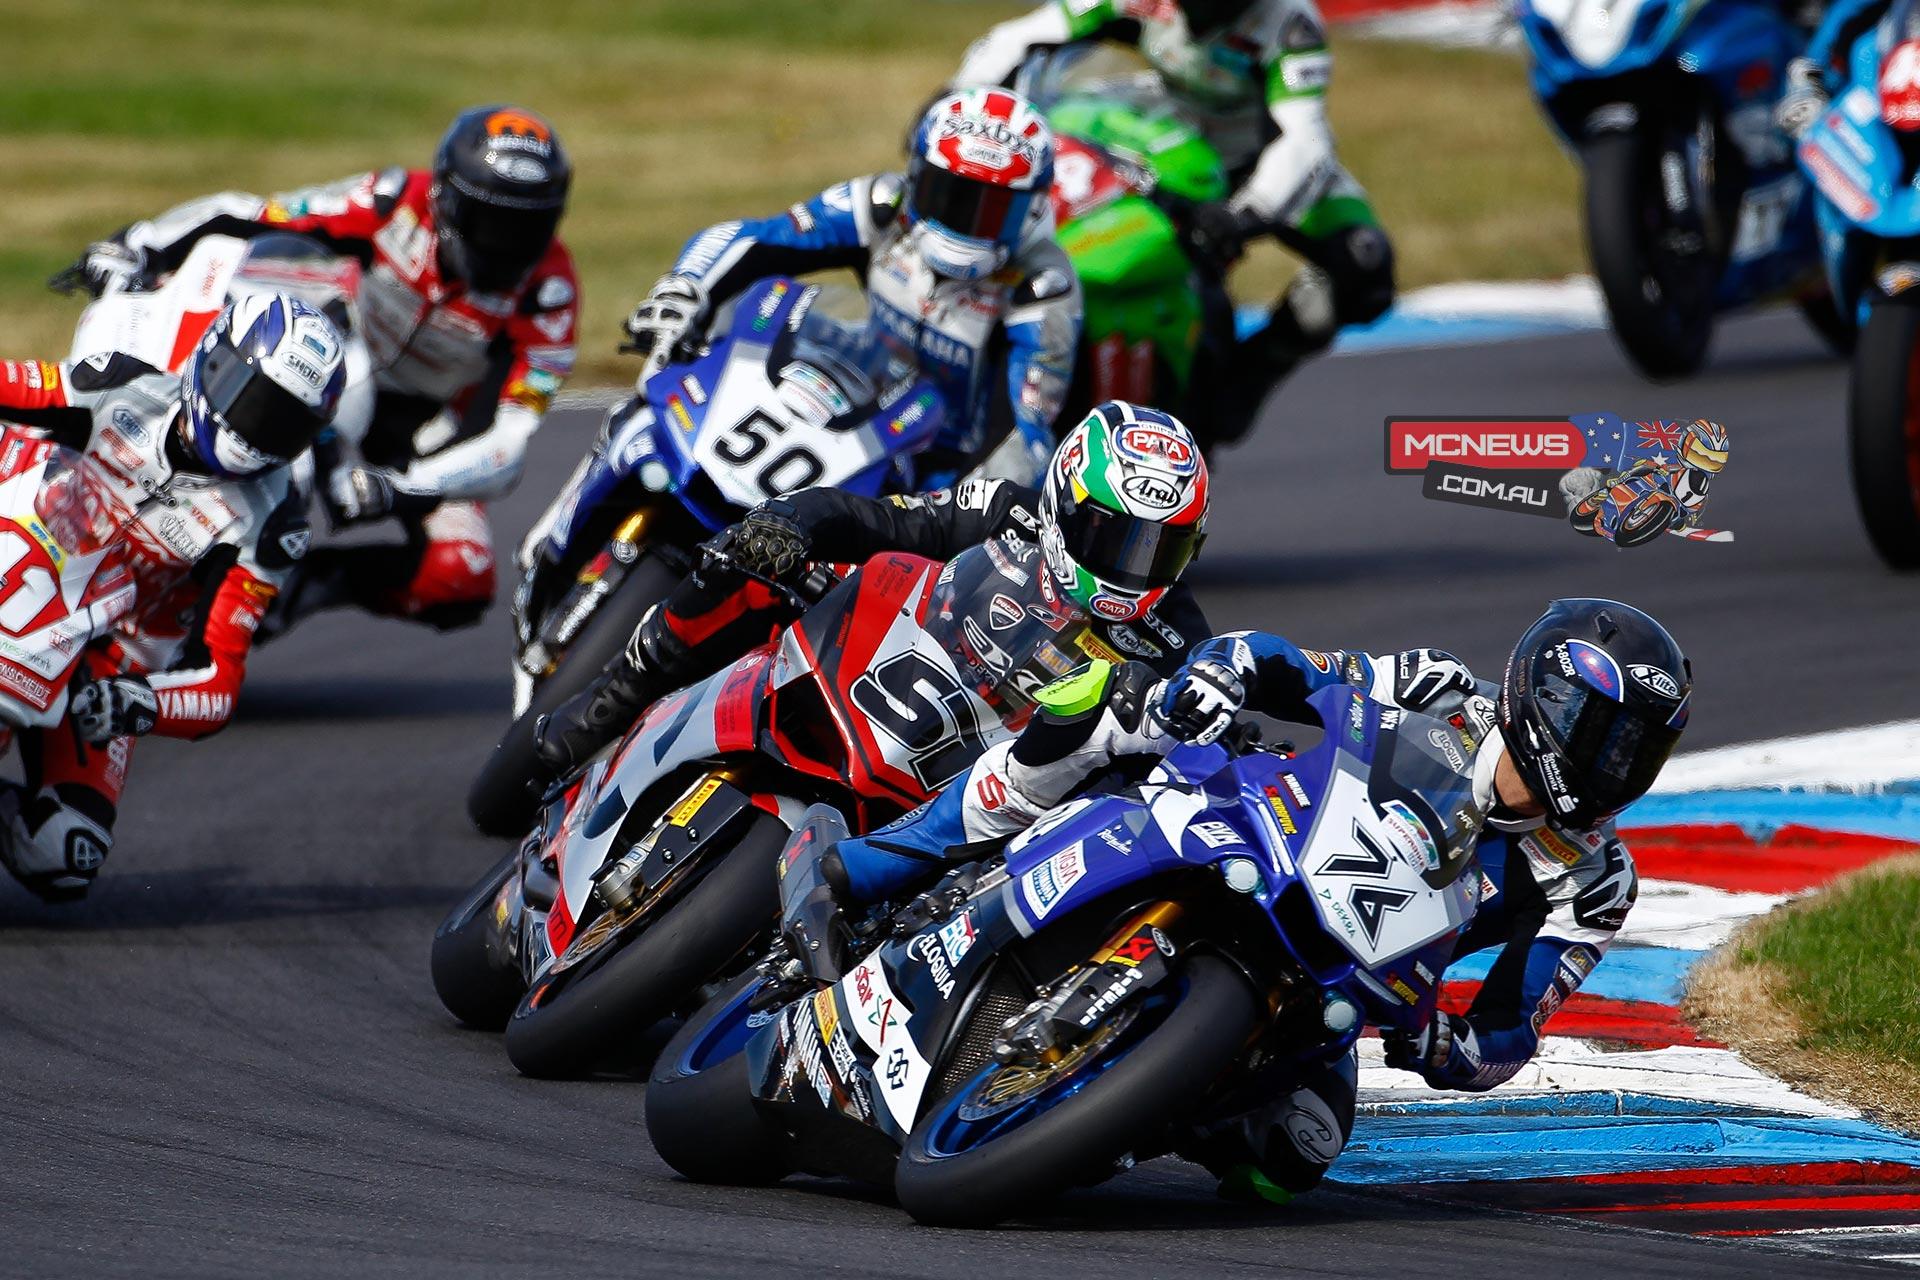 IDM Superbike Lausitzring 2015 - Max Neukirchner leads